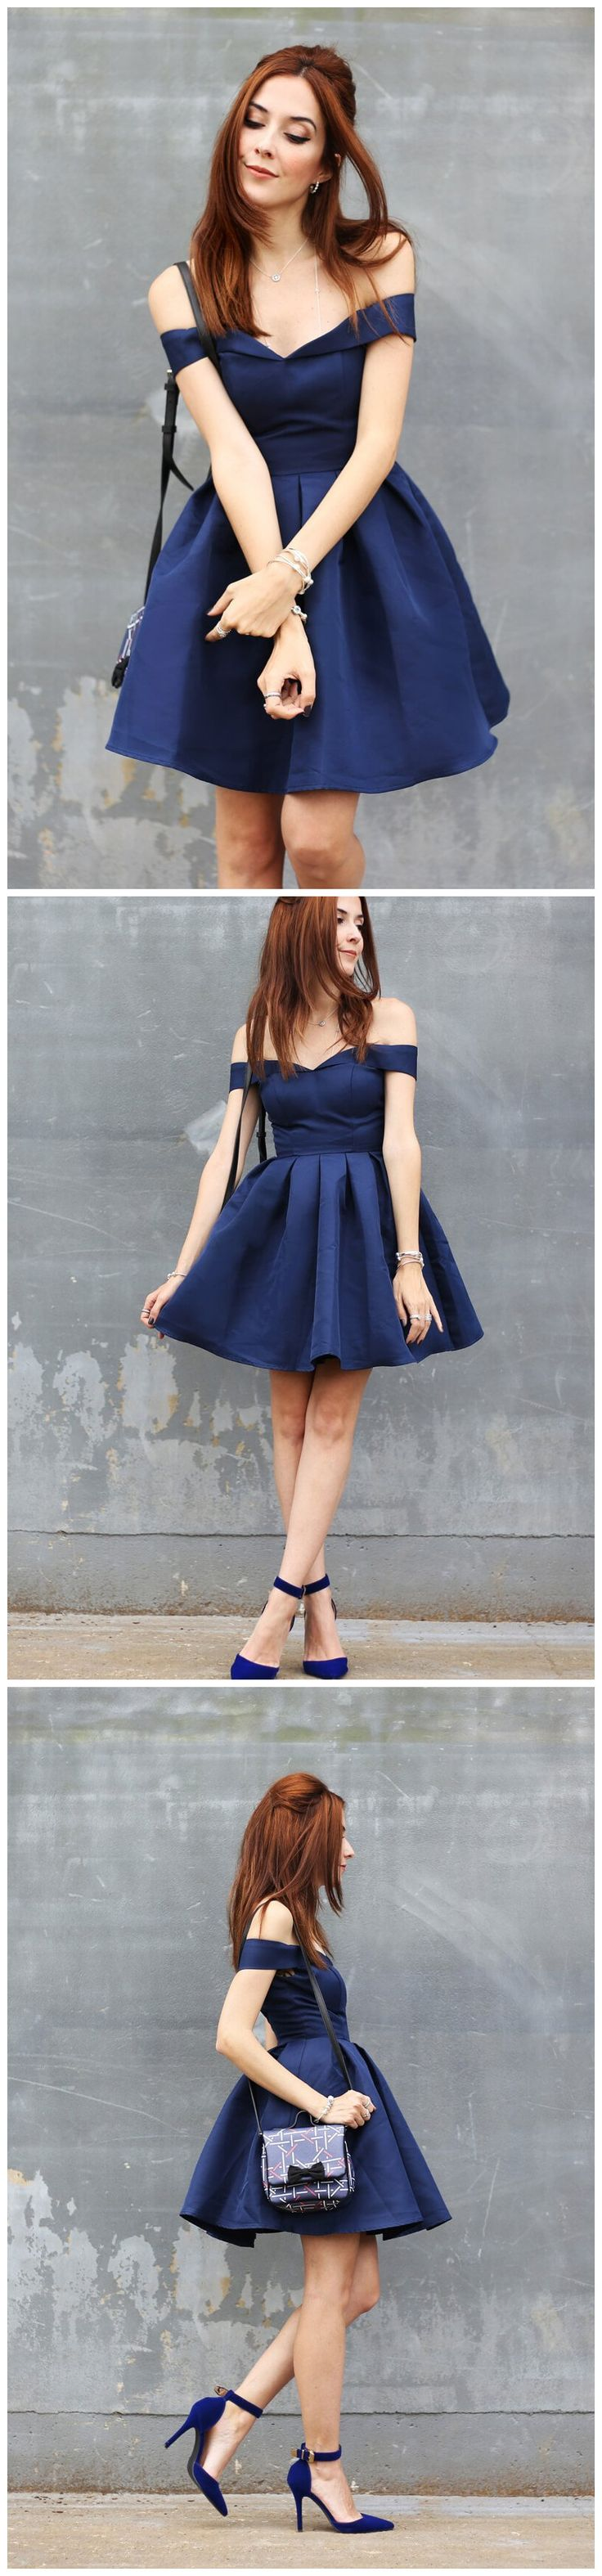 CHIC A-LINE OFF-THE-SHOULDER HOMECOMING DRESS MODEST BLUE CHEAP SHORT PROM DRESS AM088